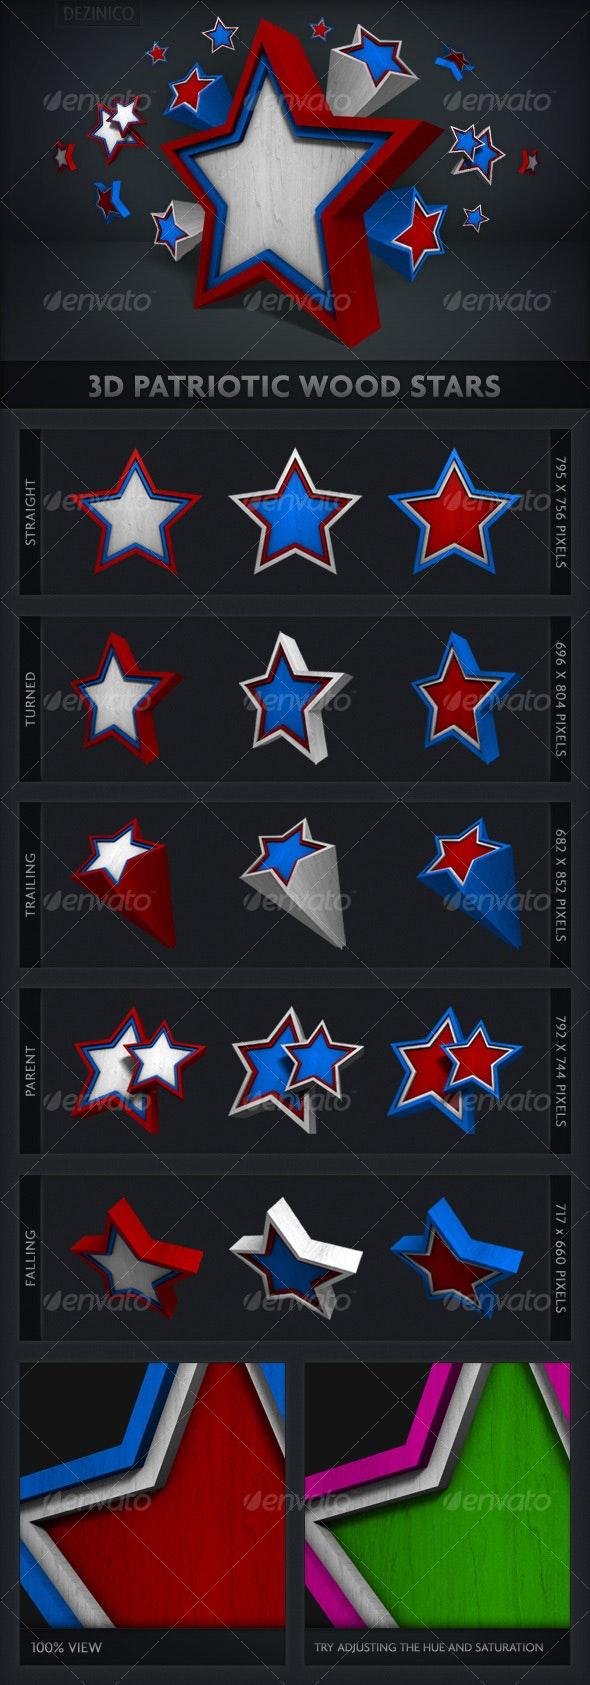 3D Patriotic Wood Stars - Objects 3D Renders